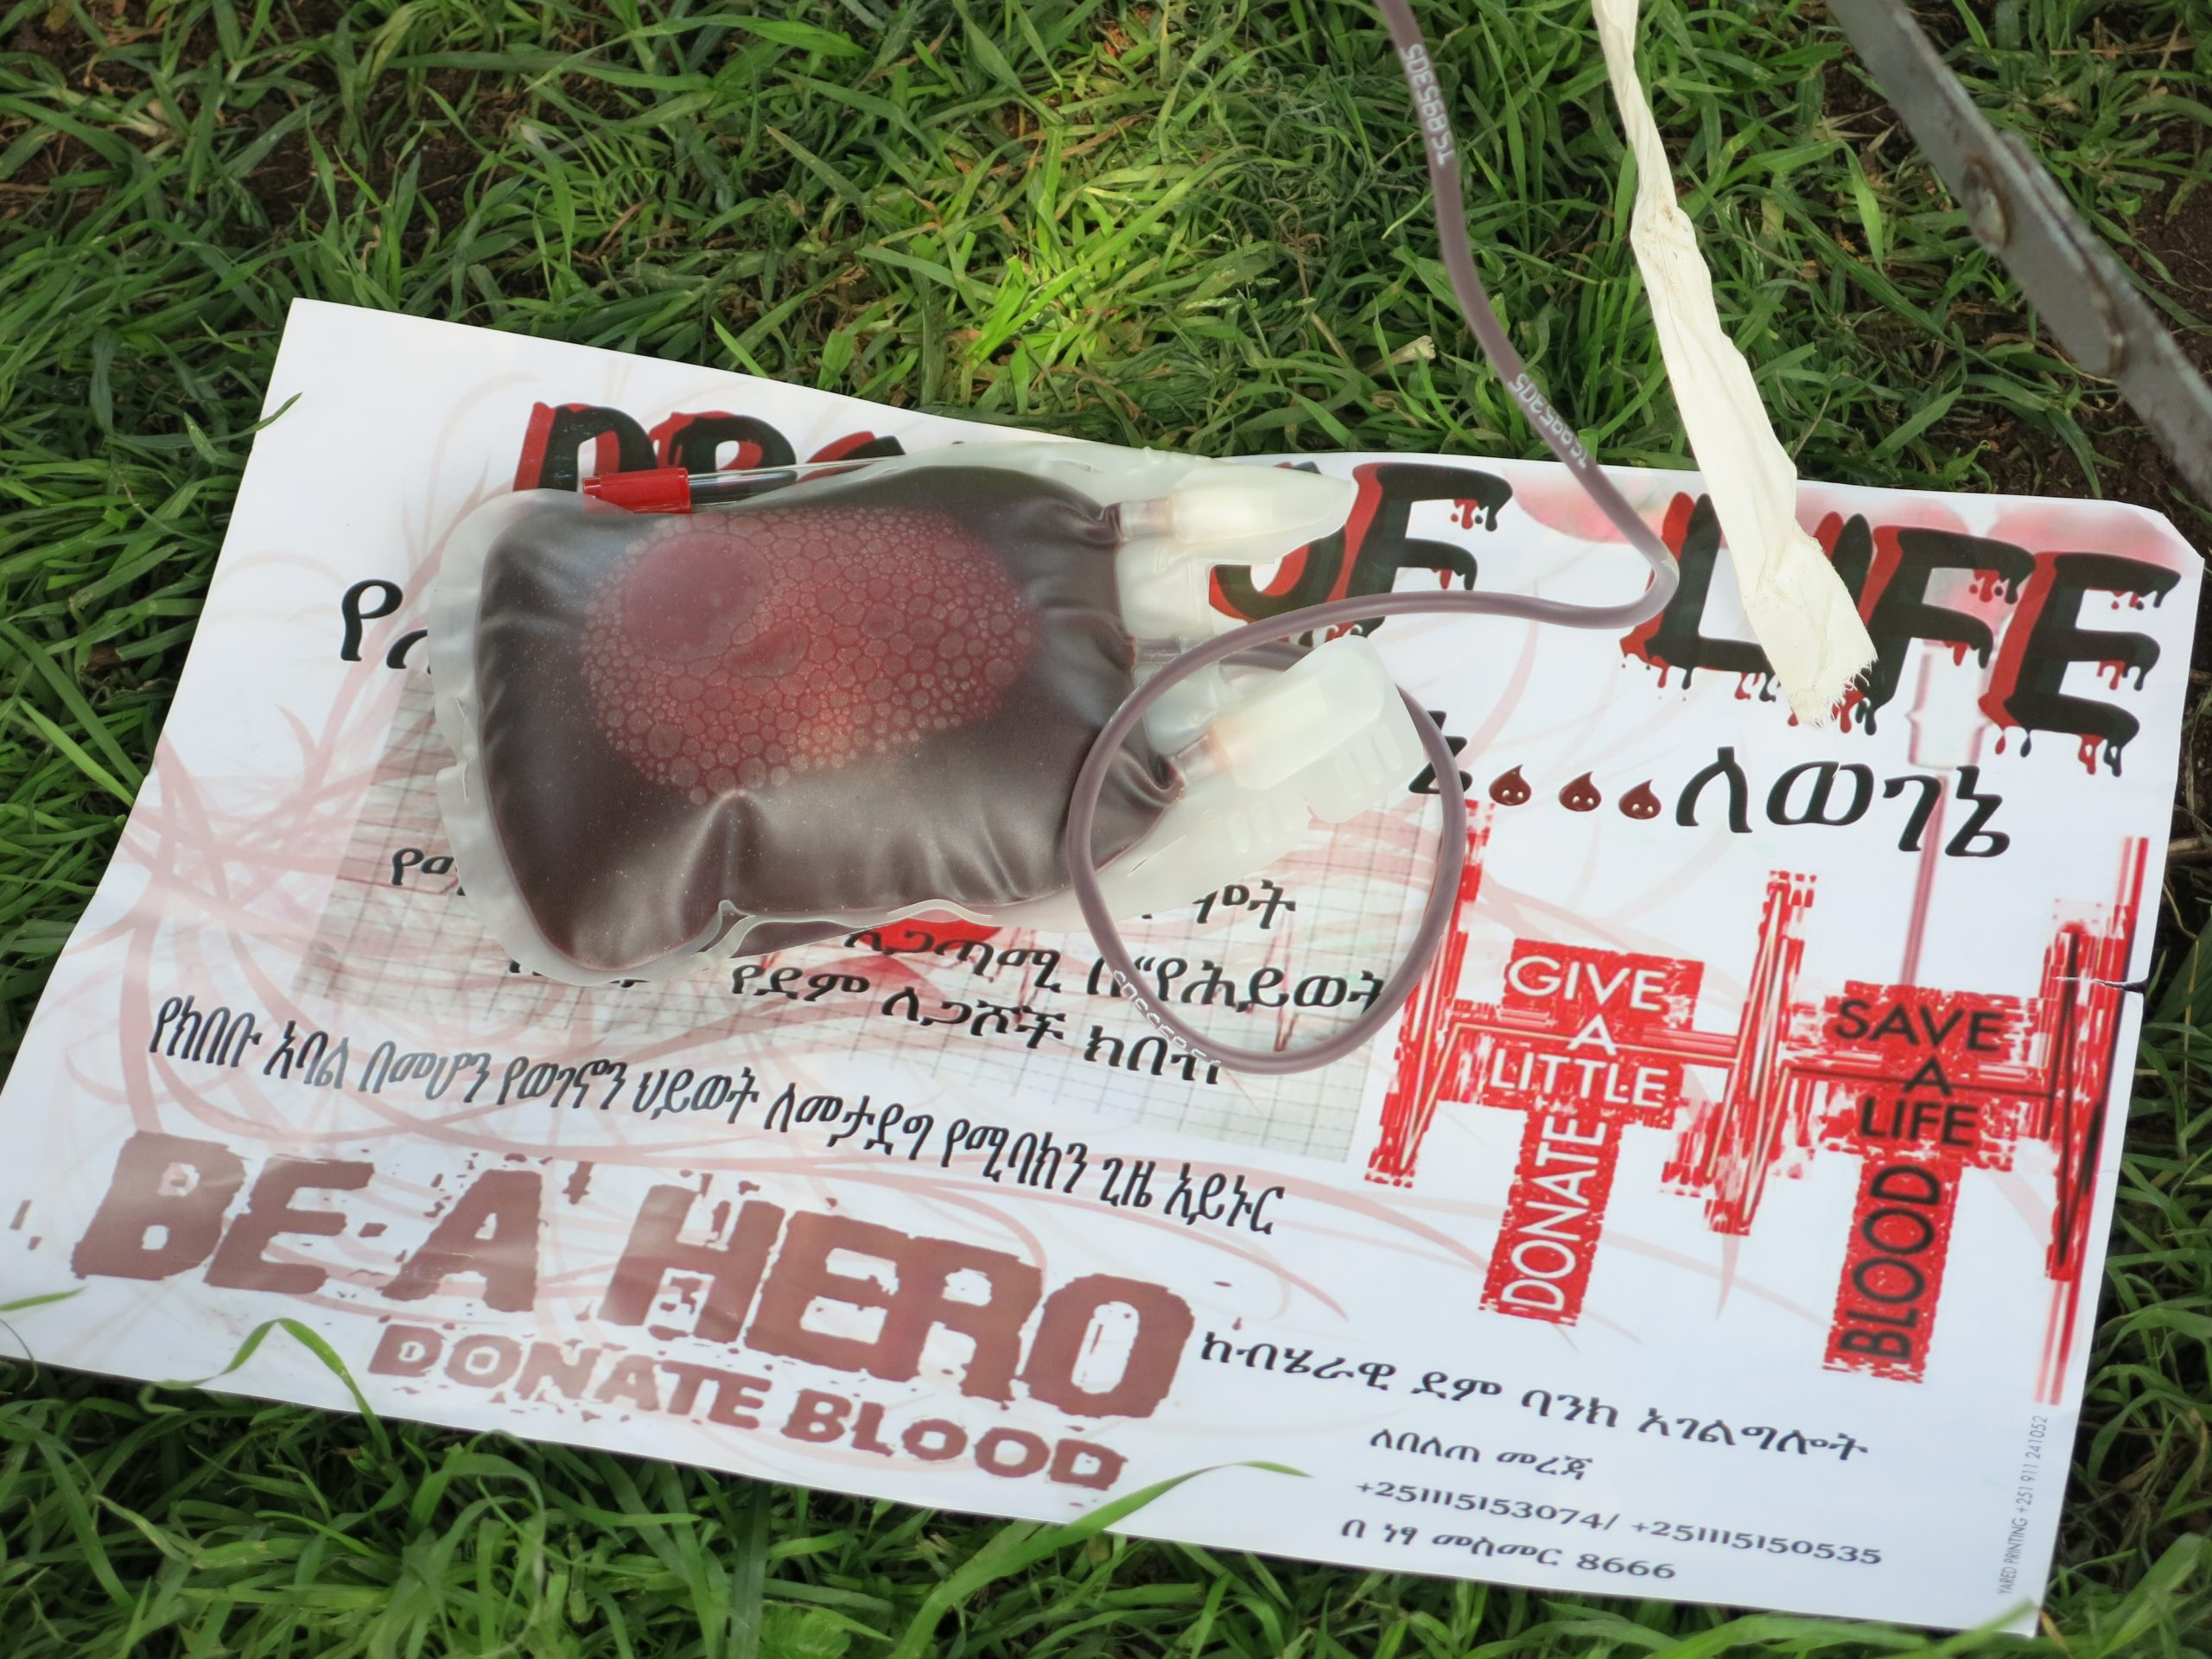 Etiopía dona vida, dona sangre